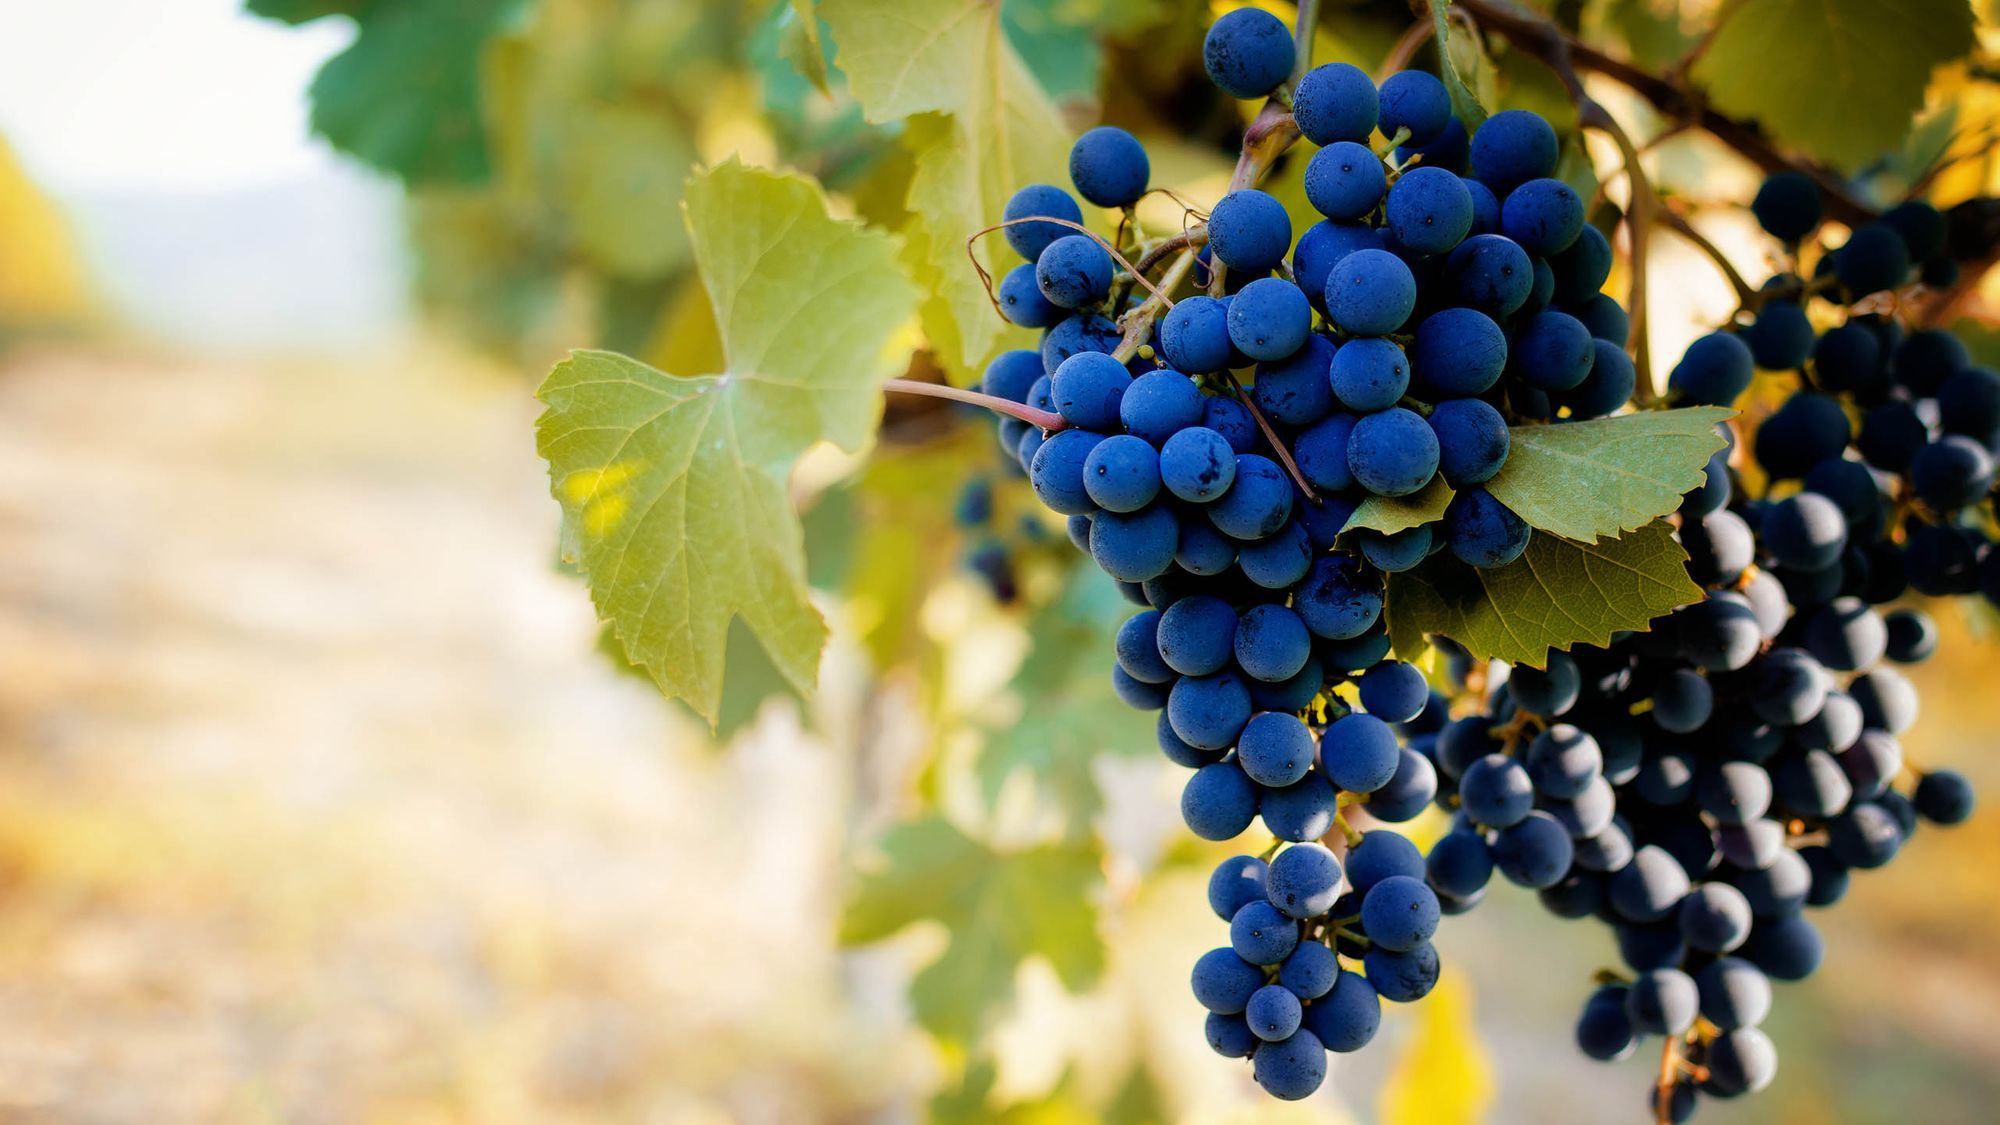 Barbera grapes on the vine